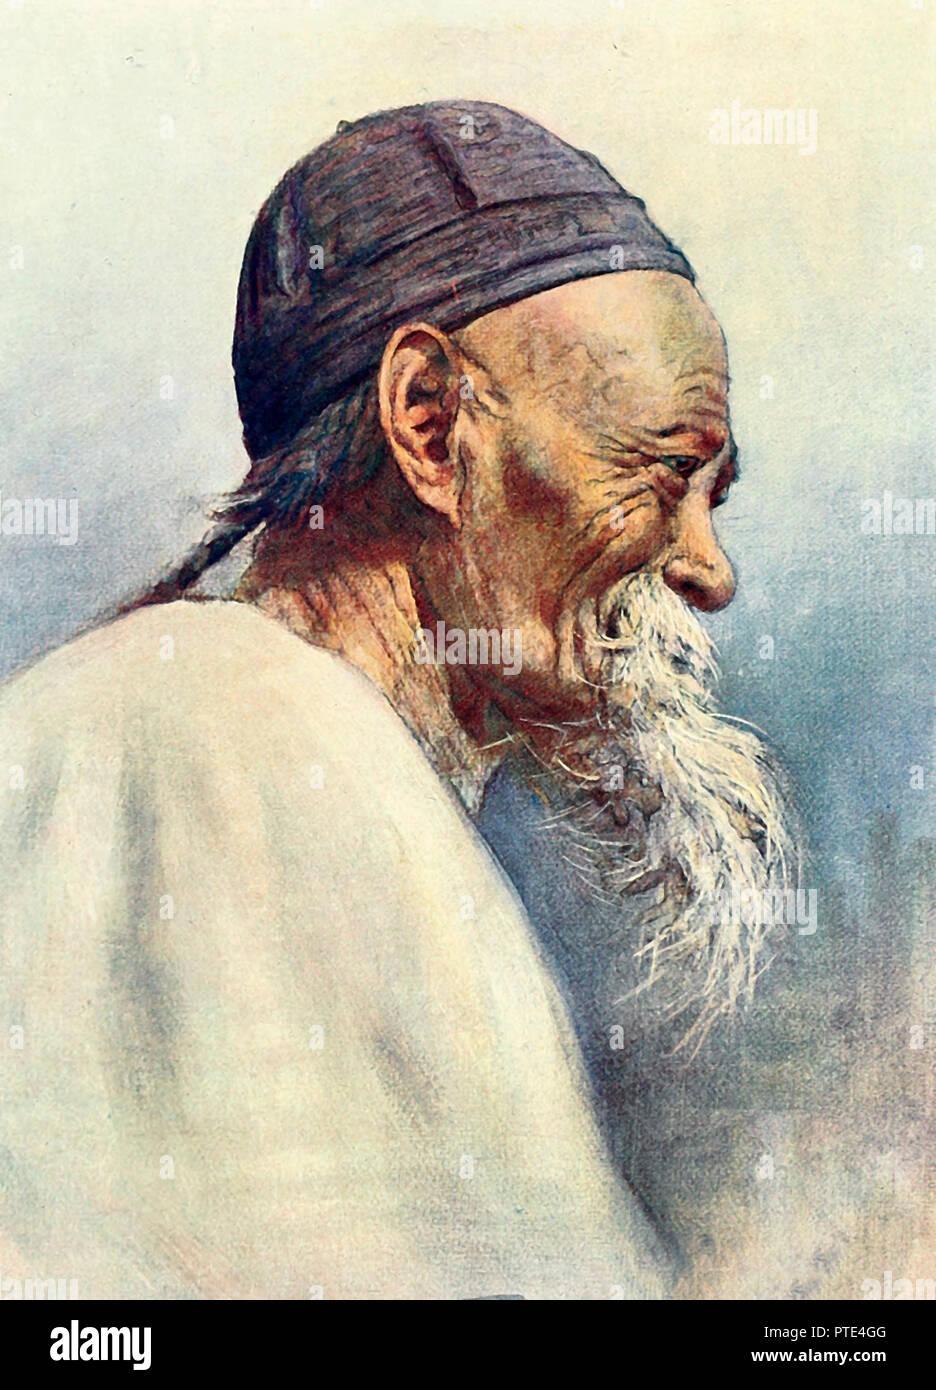 A Grandfather in China, circa 1909 - Stock Image